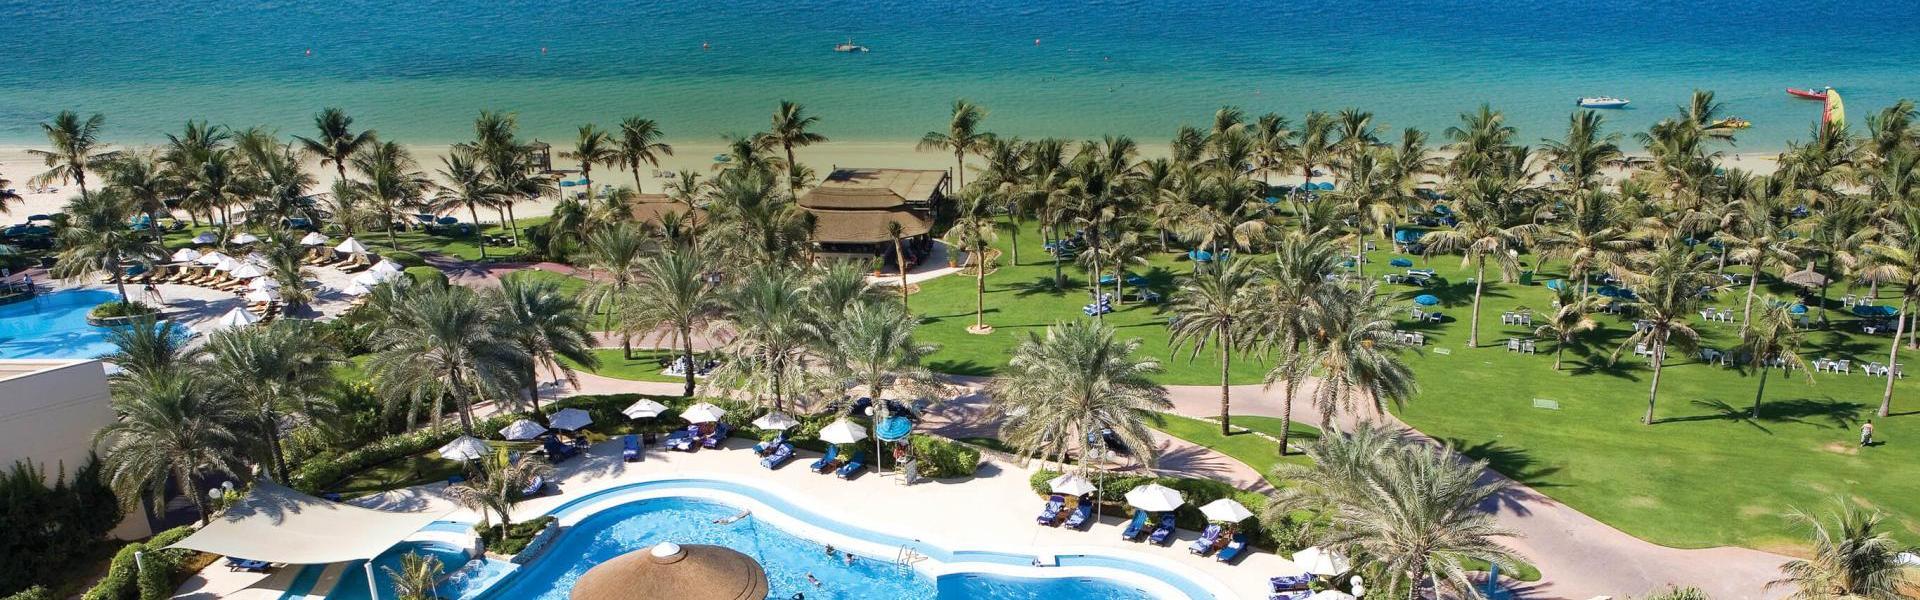 JA Beach Hotel (Dubai utazások)